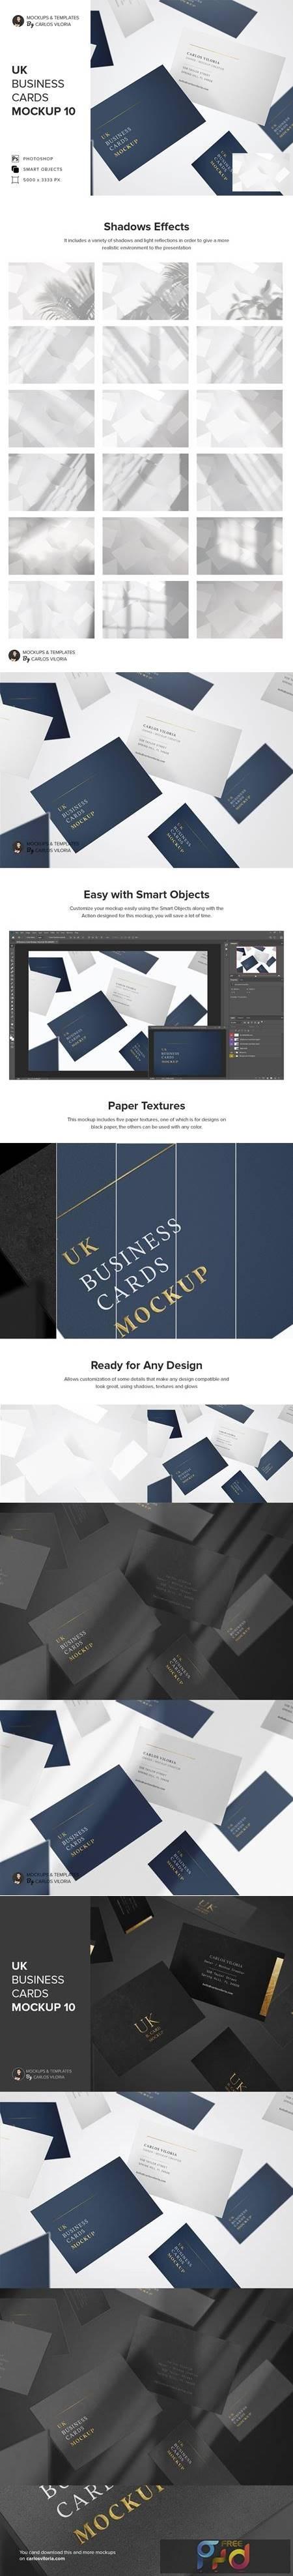 UK Business Cards Mockup 10 5217186 1